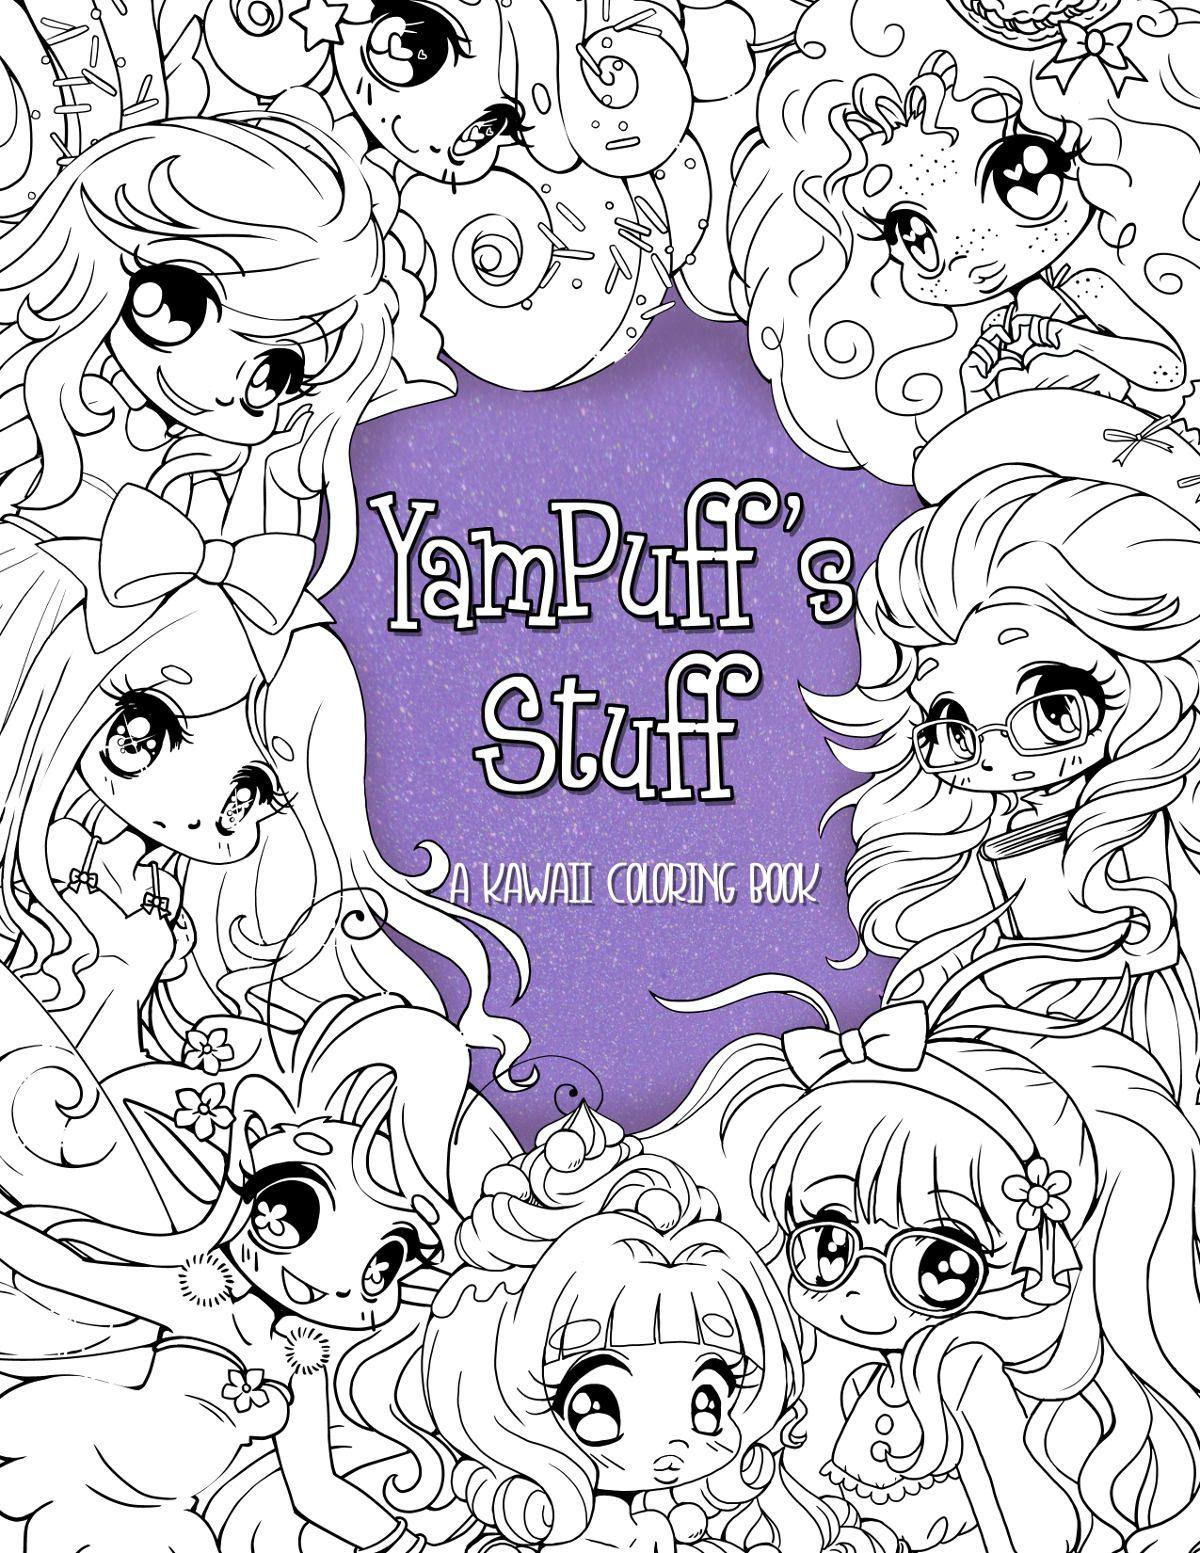 NEW YamPuff\'s Stuff - A Digital Kawaii Coloring eBook of Chibis and ...